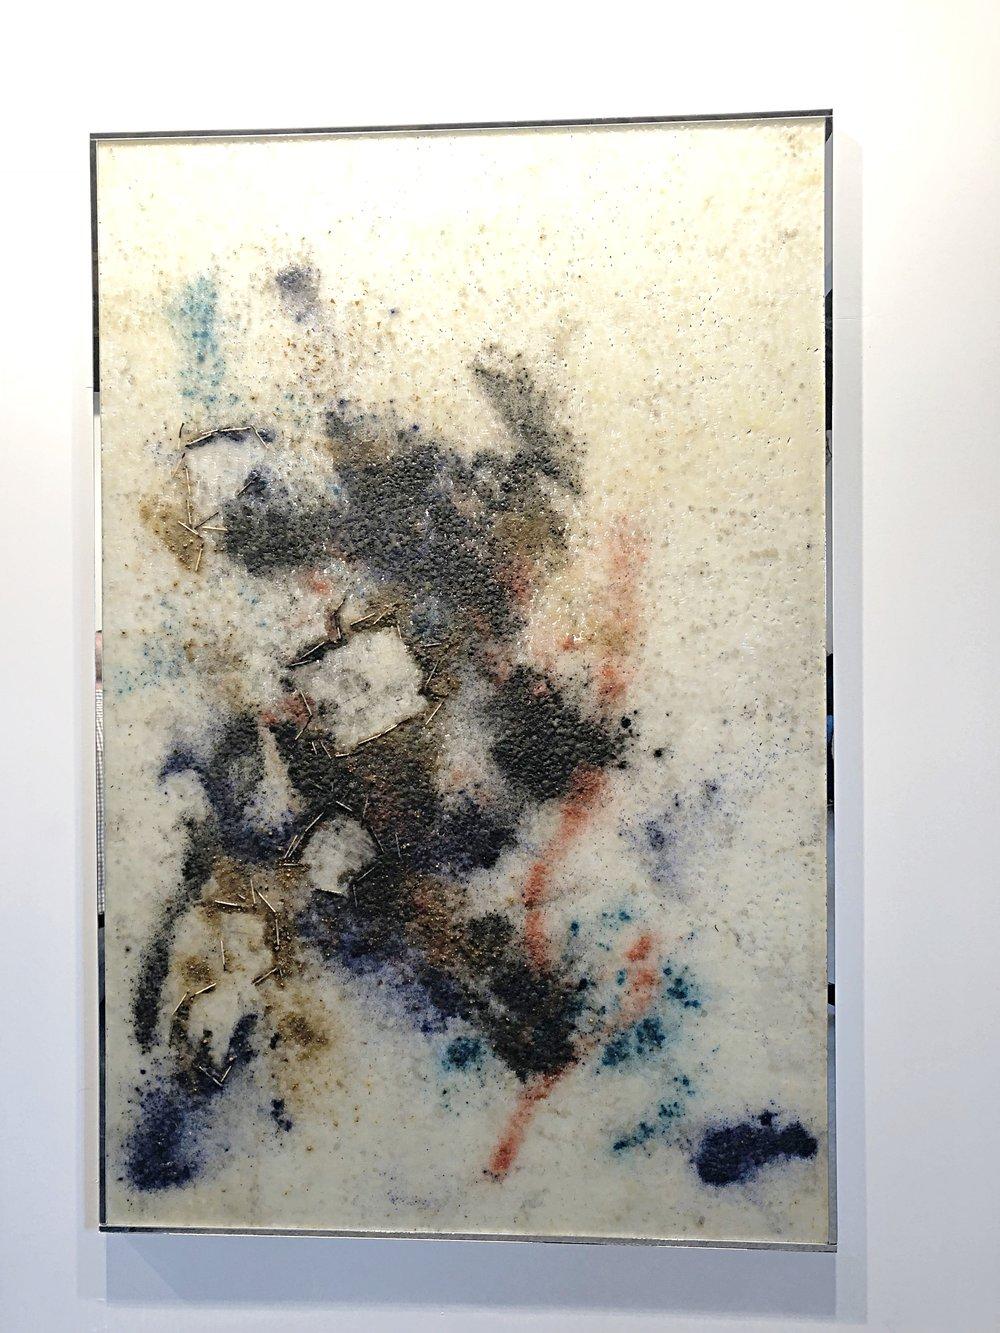 Mauro Cerqueiera at Nuno Centeno gallery